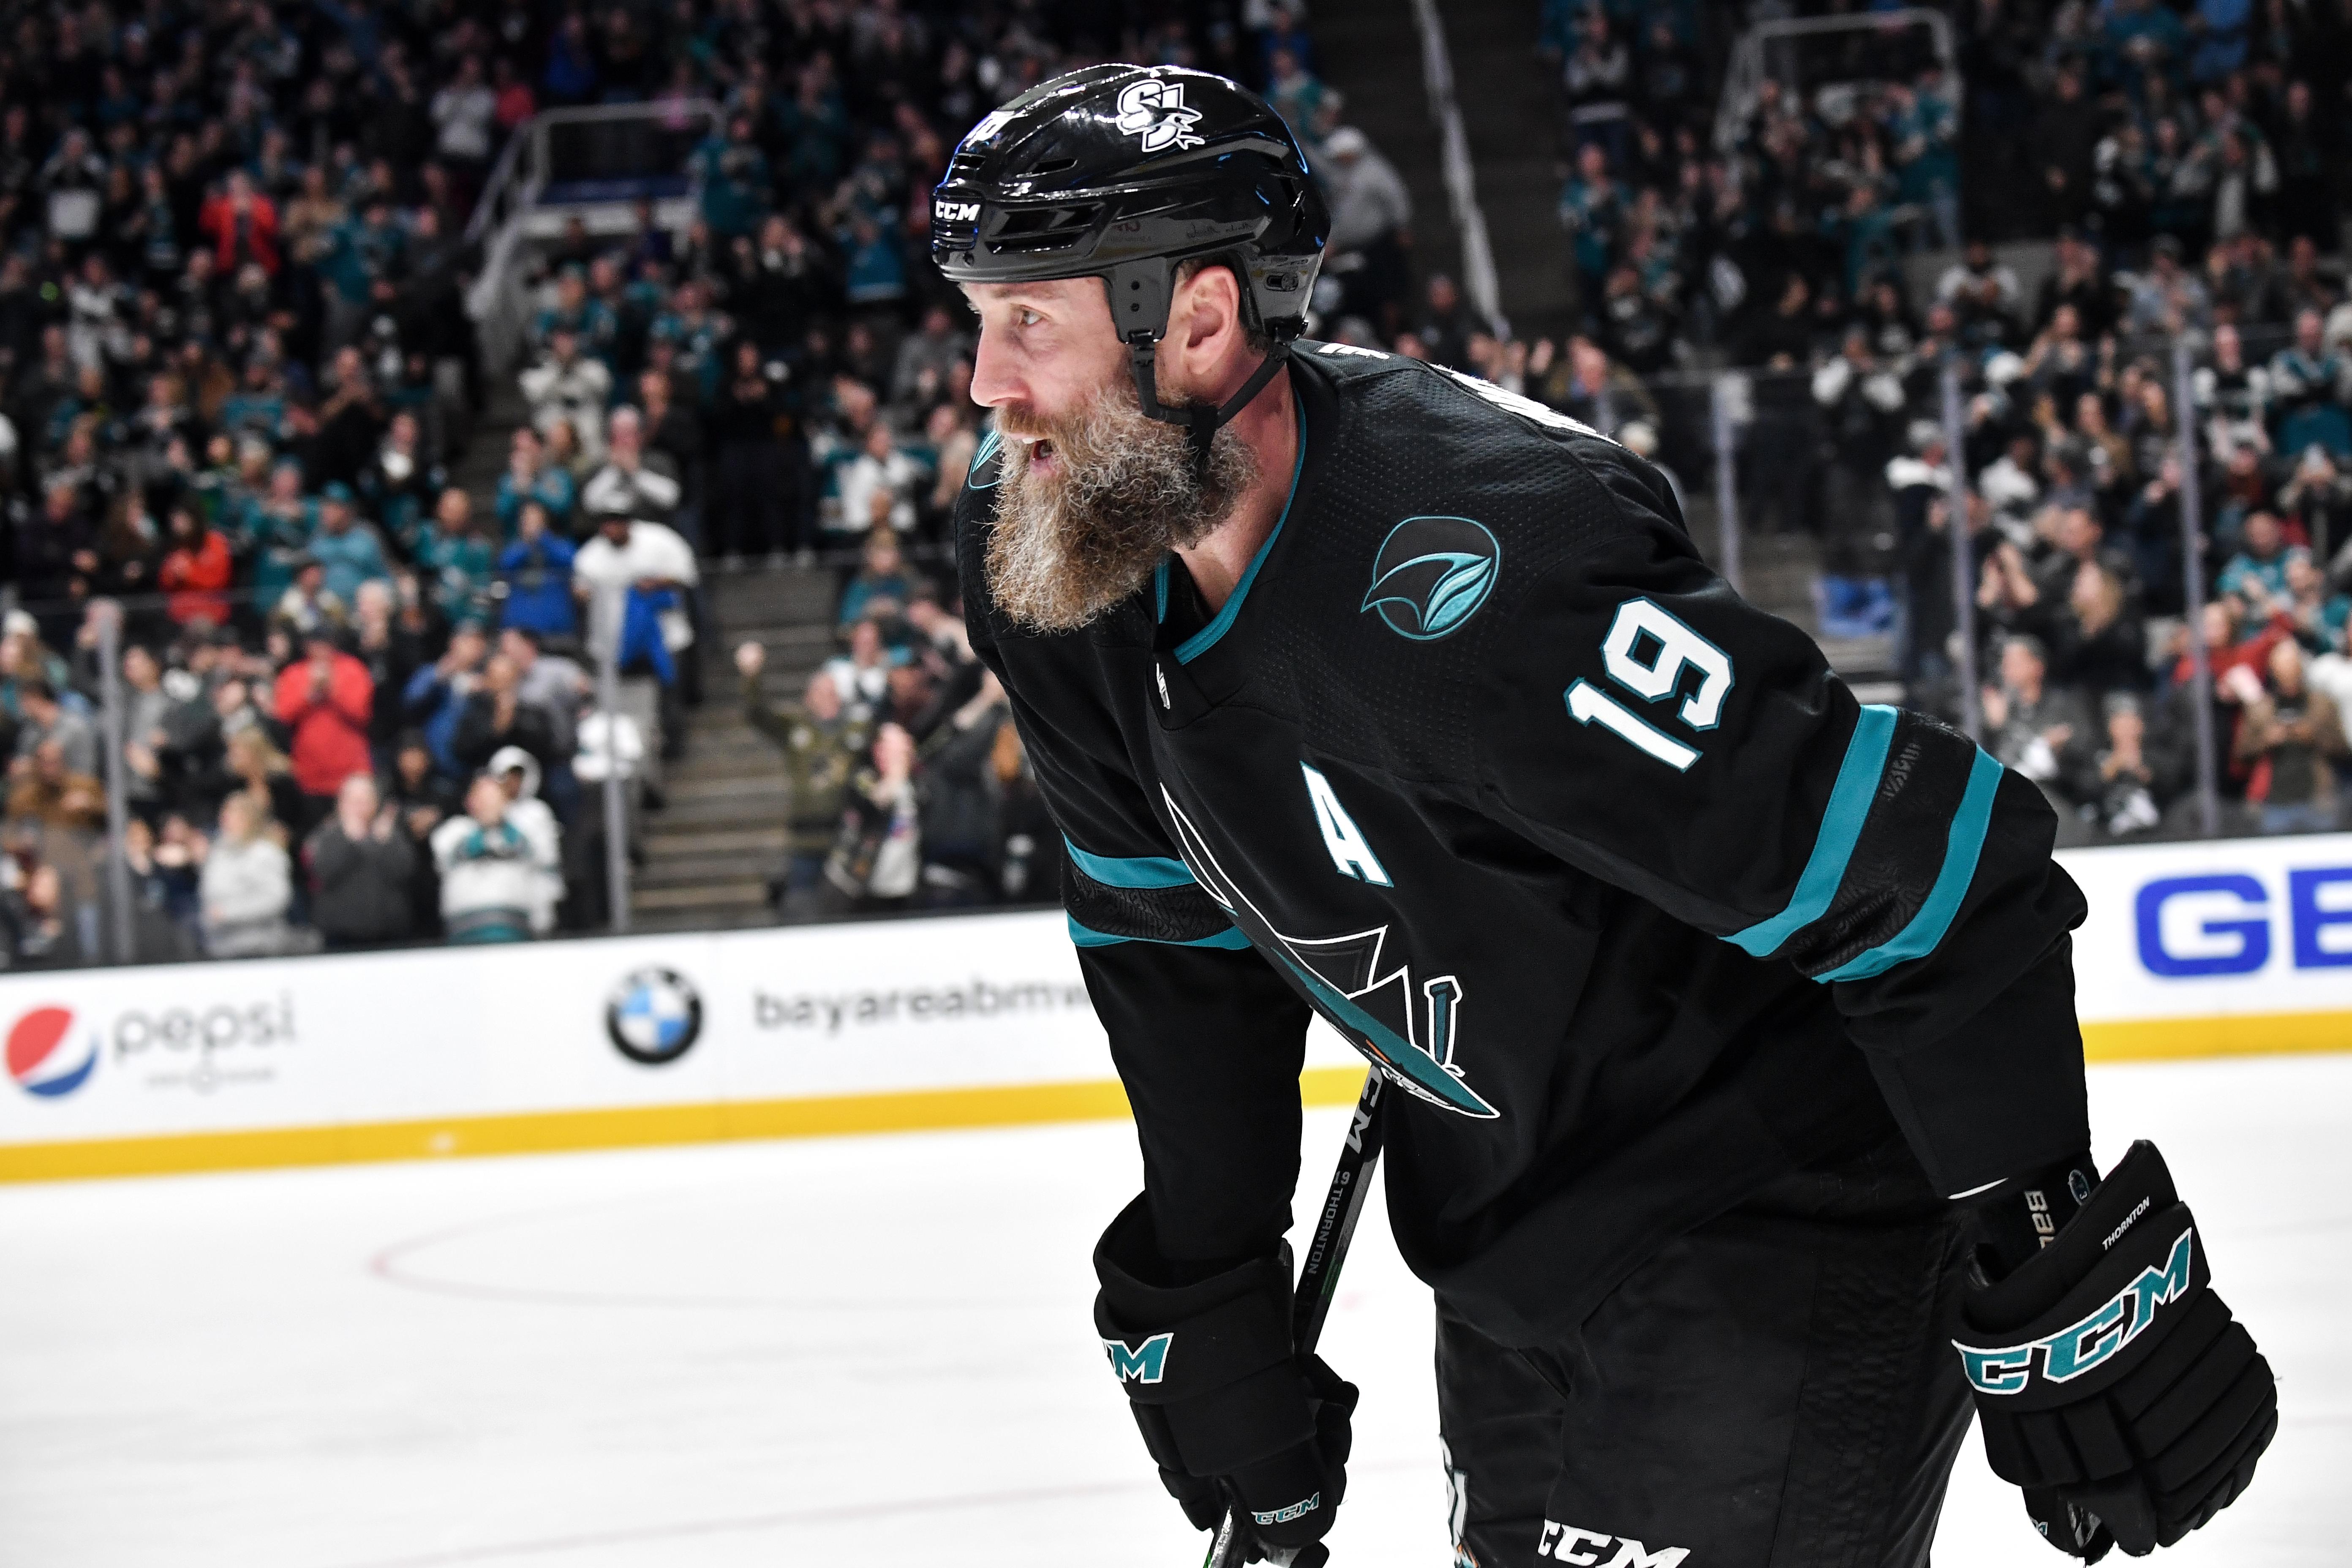 SAN JOSE, CA - DECEMBER 27: Joe Thornton #19 of the San Jose Sharks celebrates scoring a goal against the Los Angeles Kings at SAP Center on December 27, 2019 in San Jose, California.